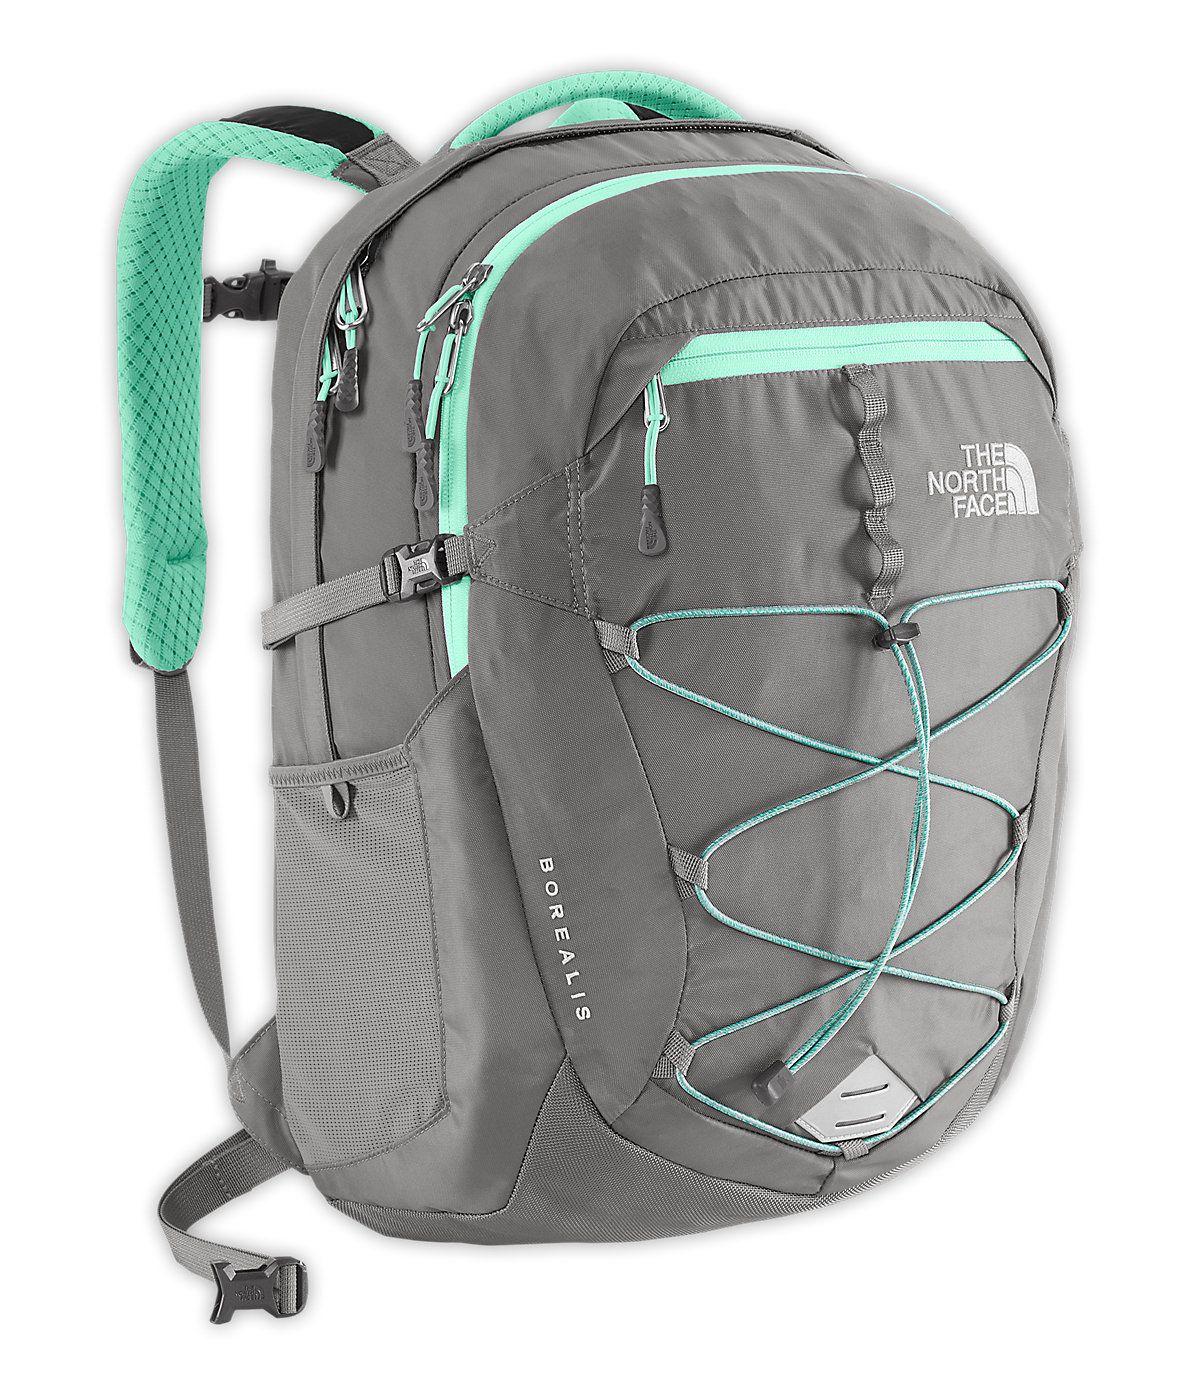 nike free 5.0 white and grey womens borealis backpack